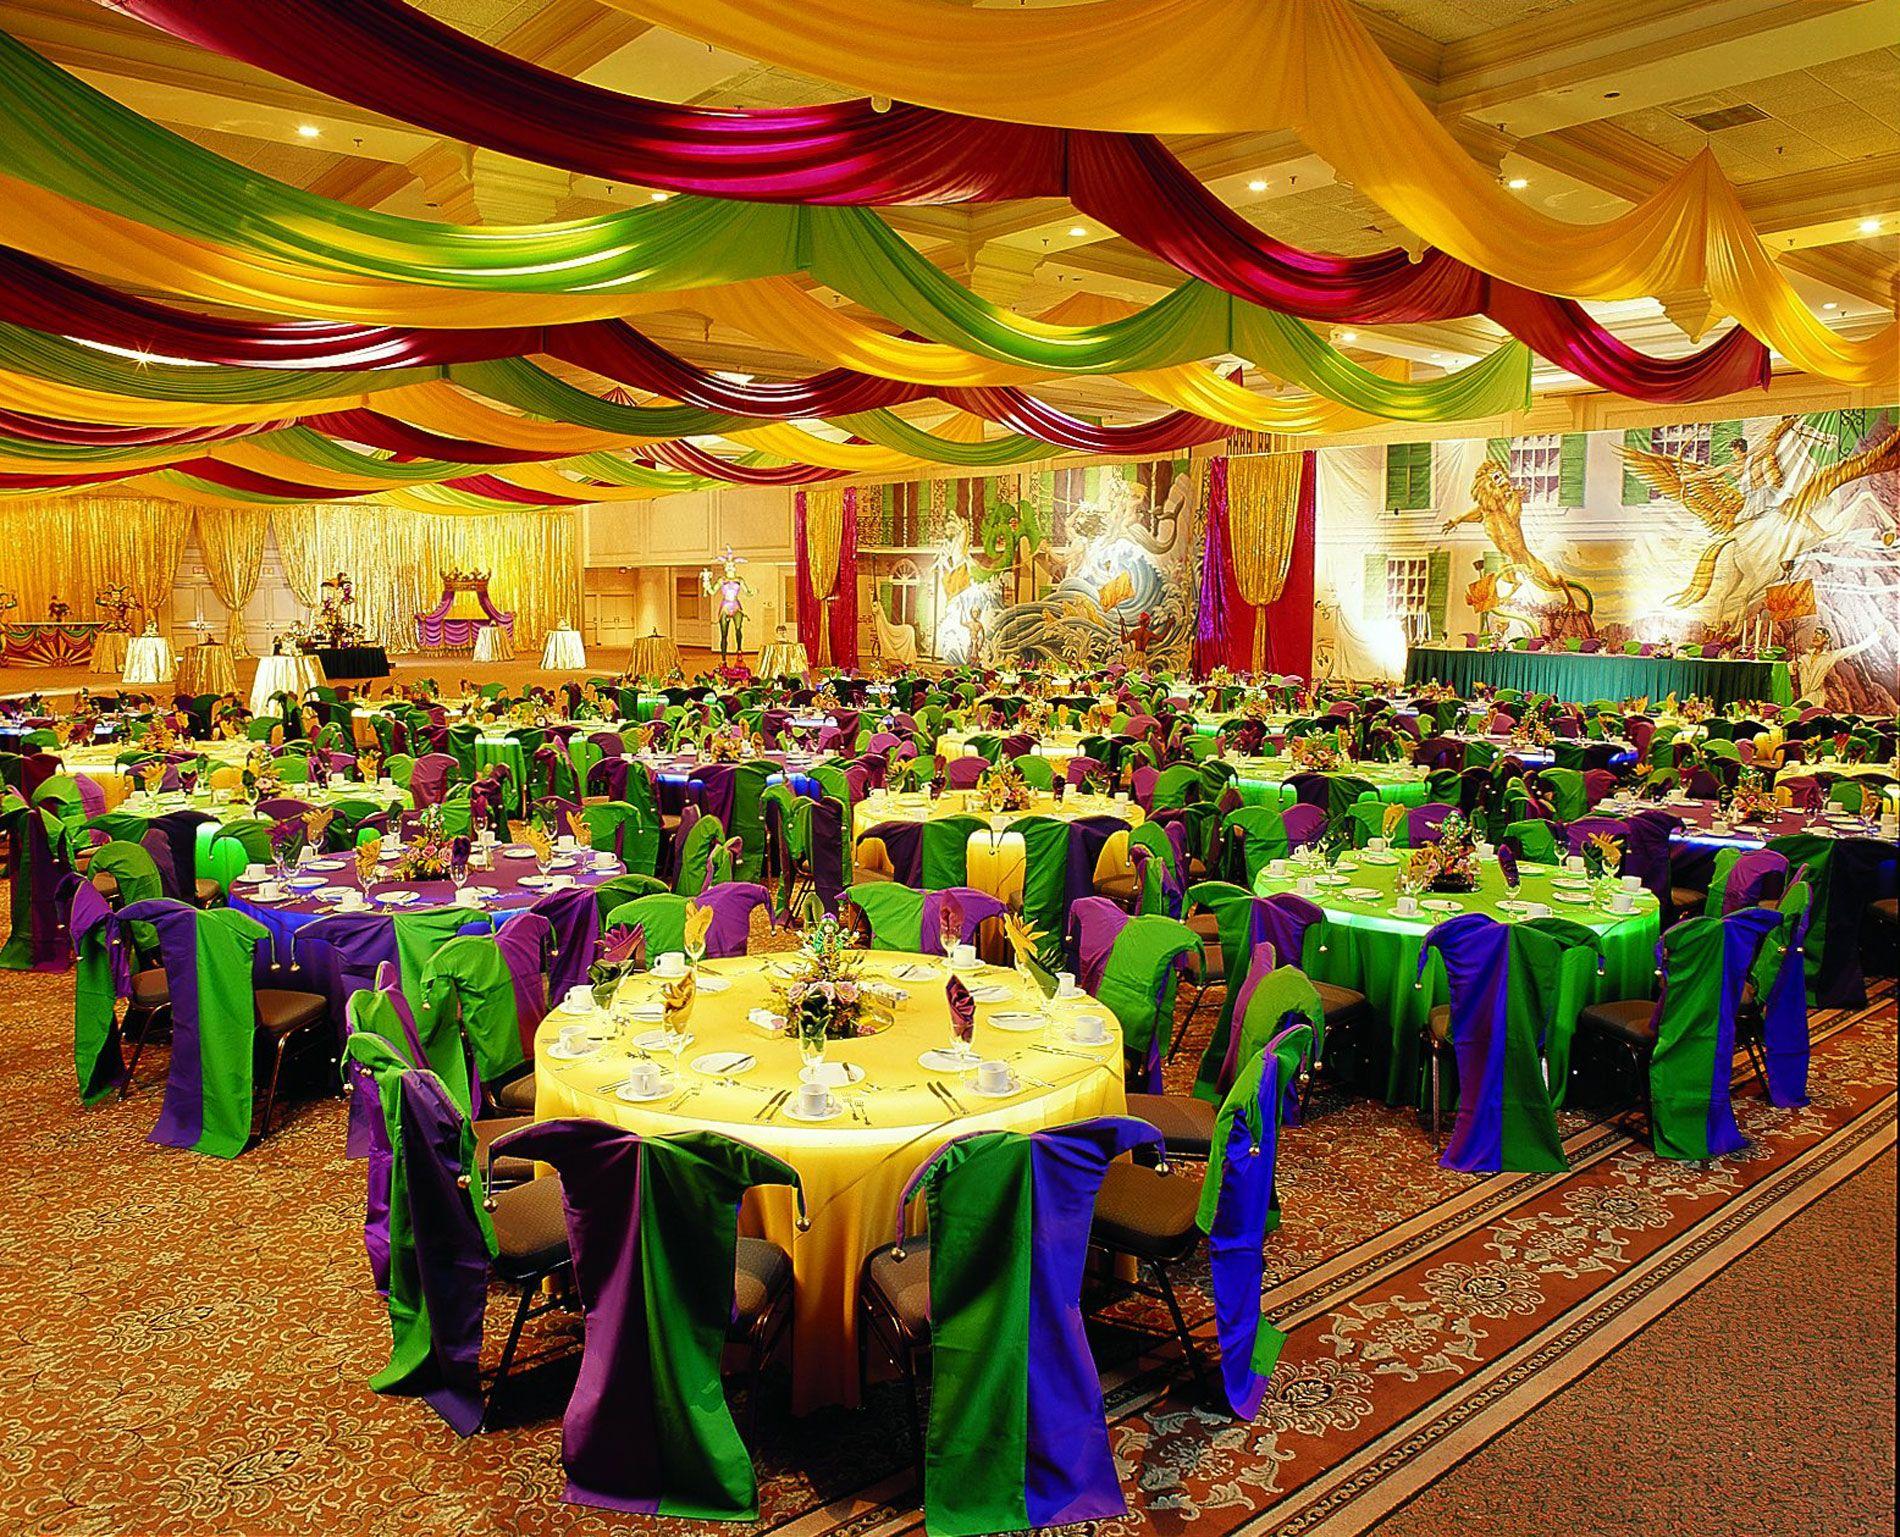 Mardi Gras Wedding Table Decorations  Mardi Gras Producitons  Mardi Gras  Mardi gras party